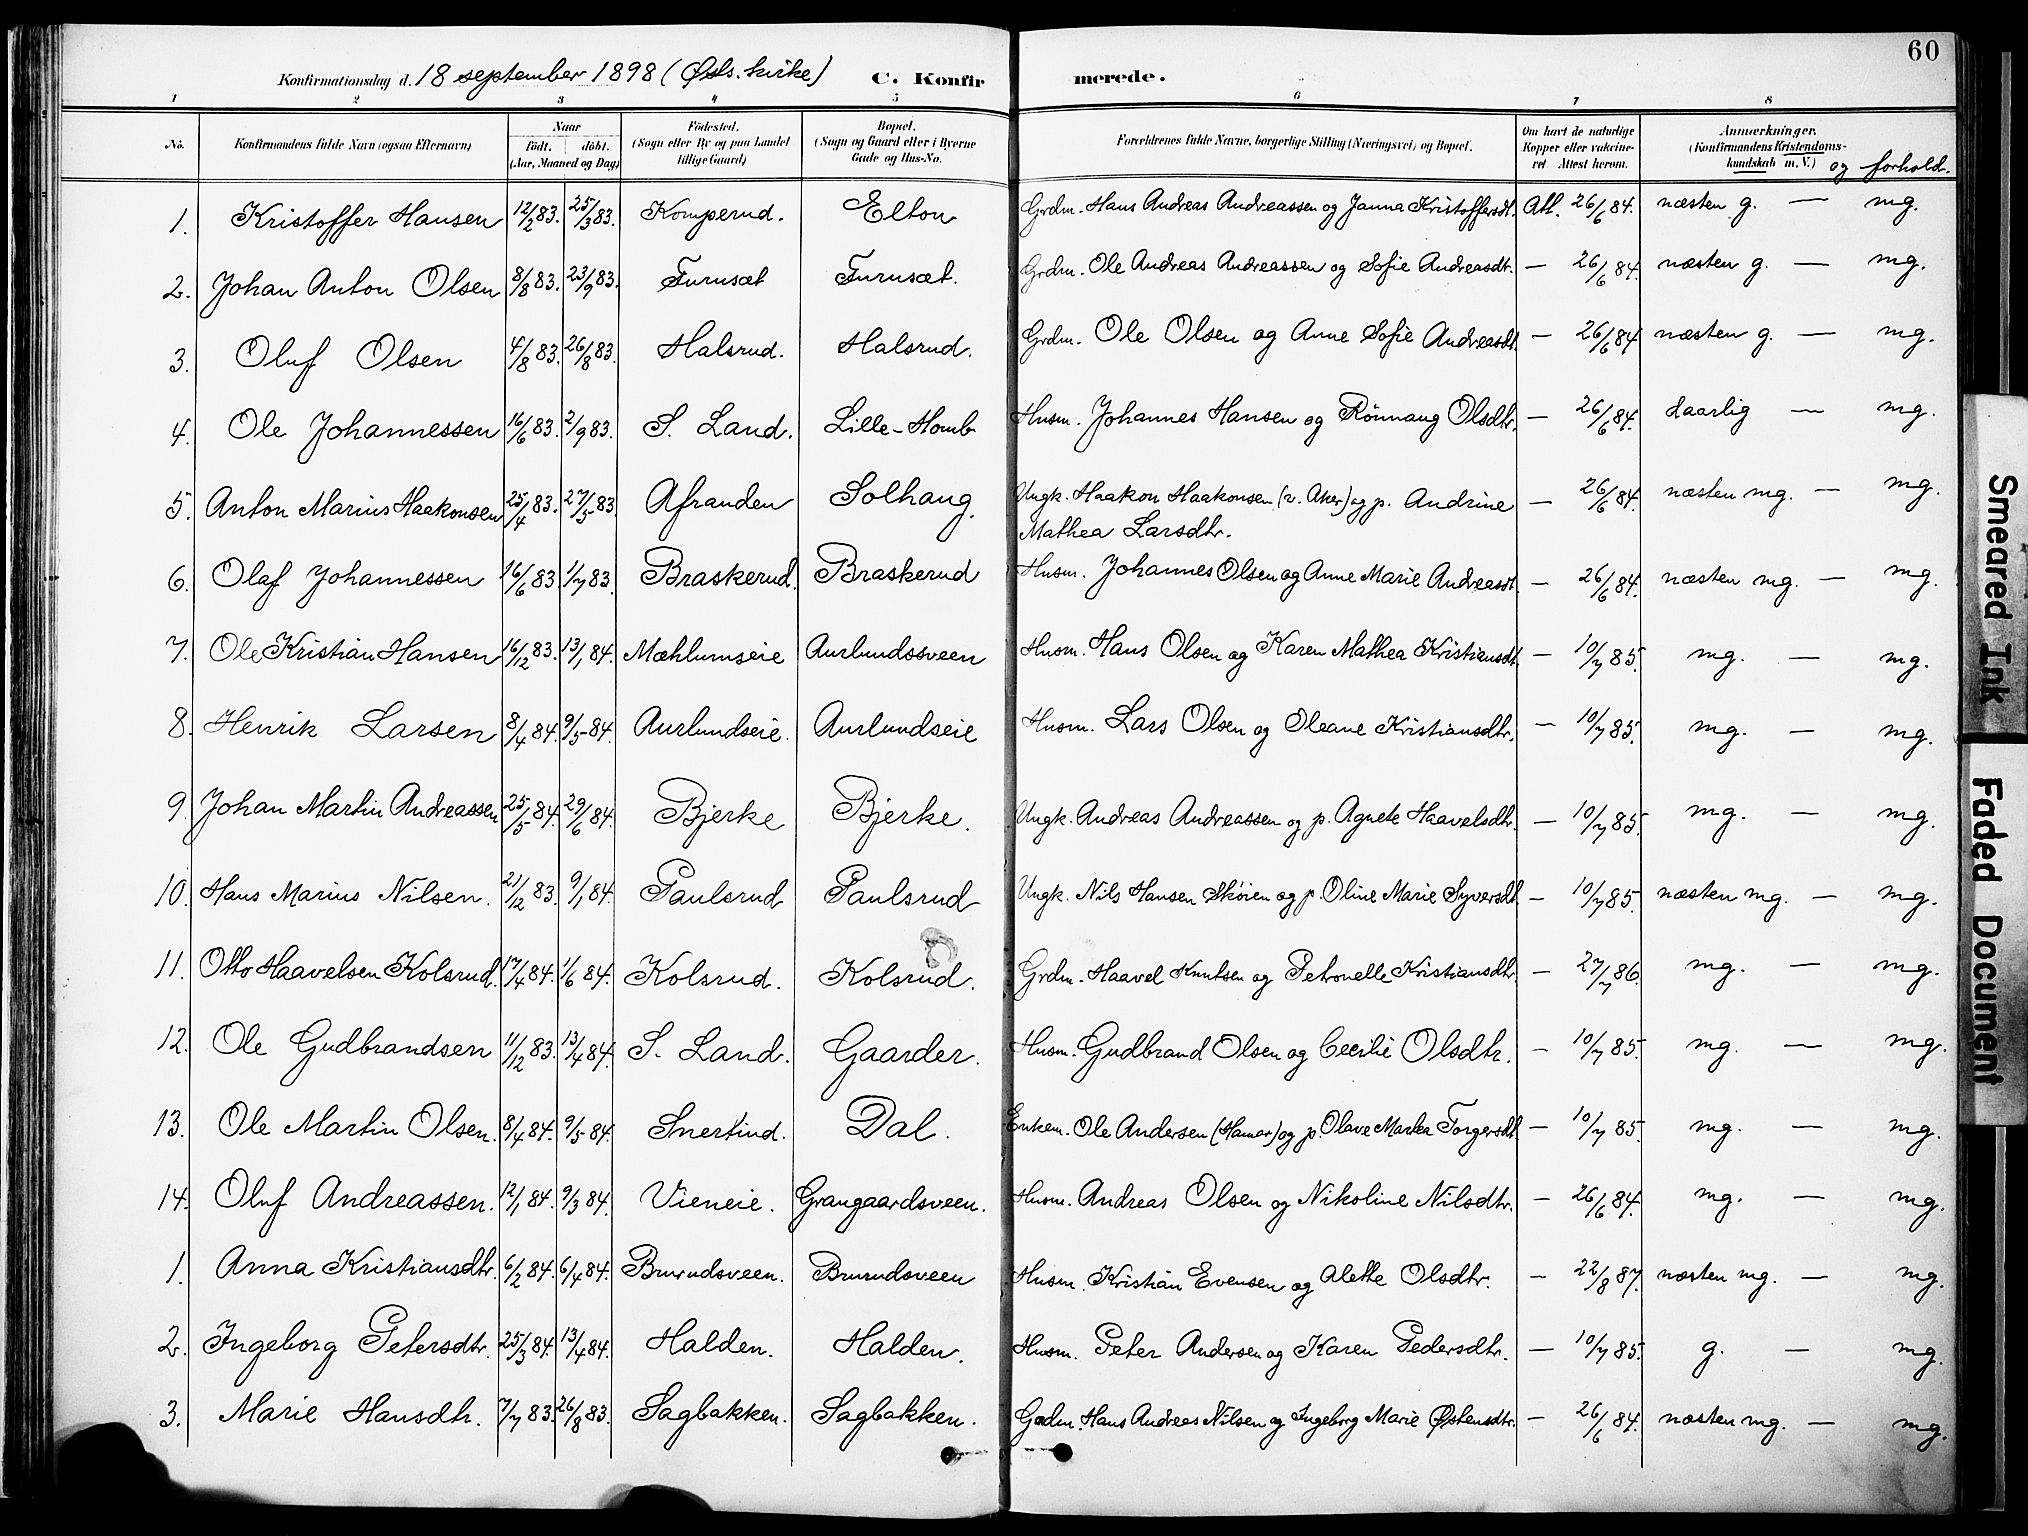 SAH, Nordre Land prestekontor, Ministerialbok nr. 6, 1897-1914, s. 60